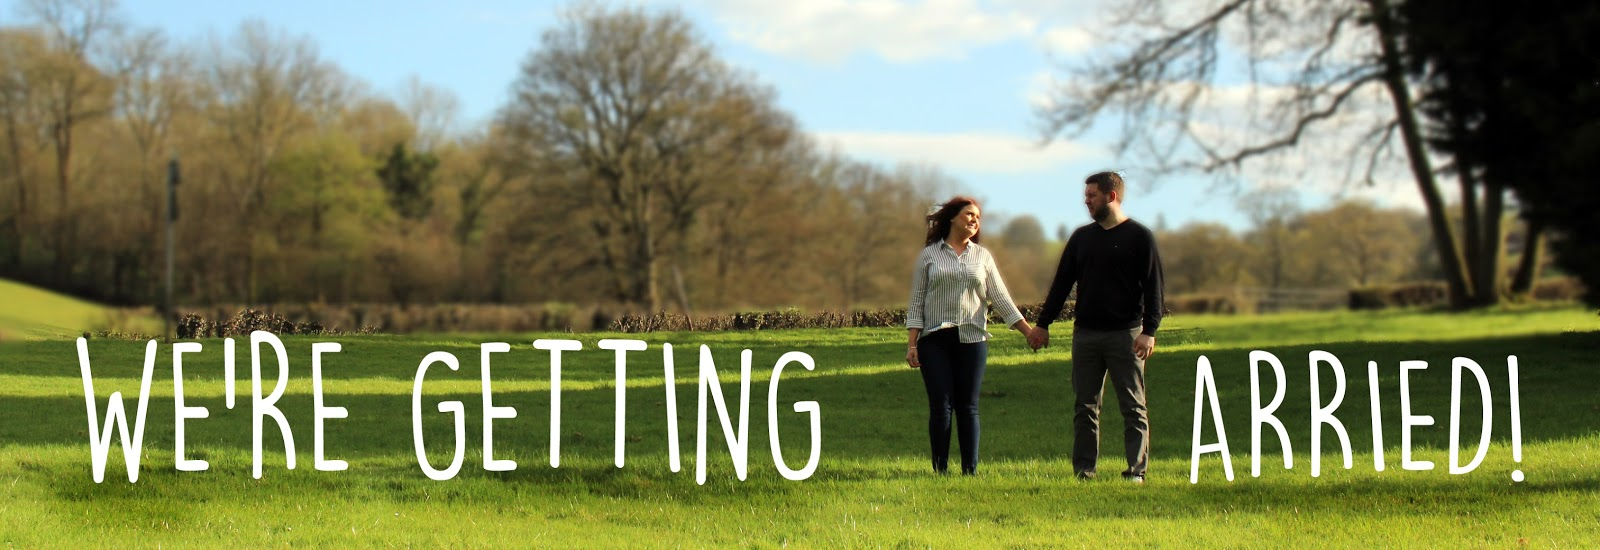 Engagement Photoshoot | Sophie Jenner | Bloglovin'